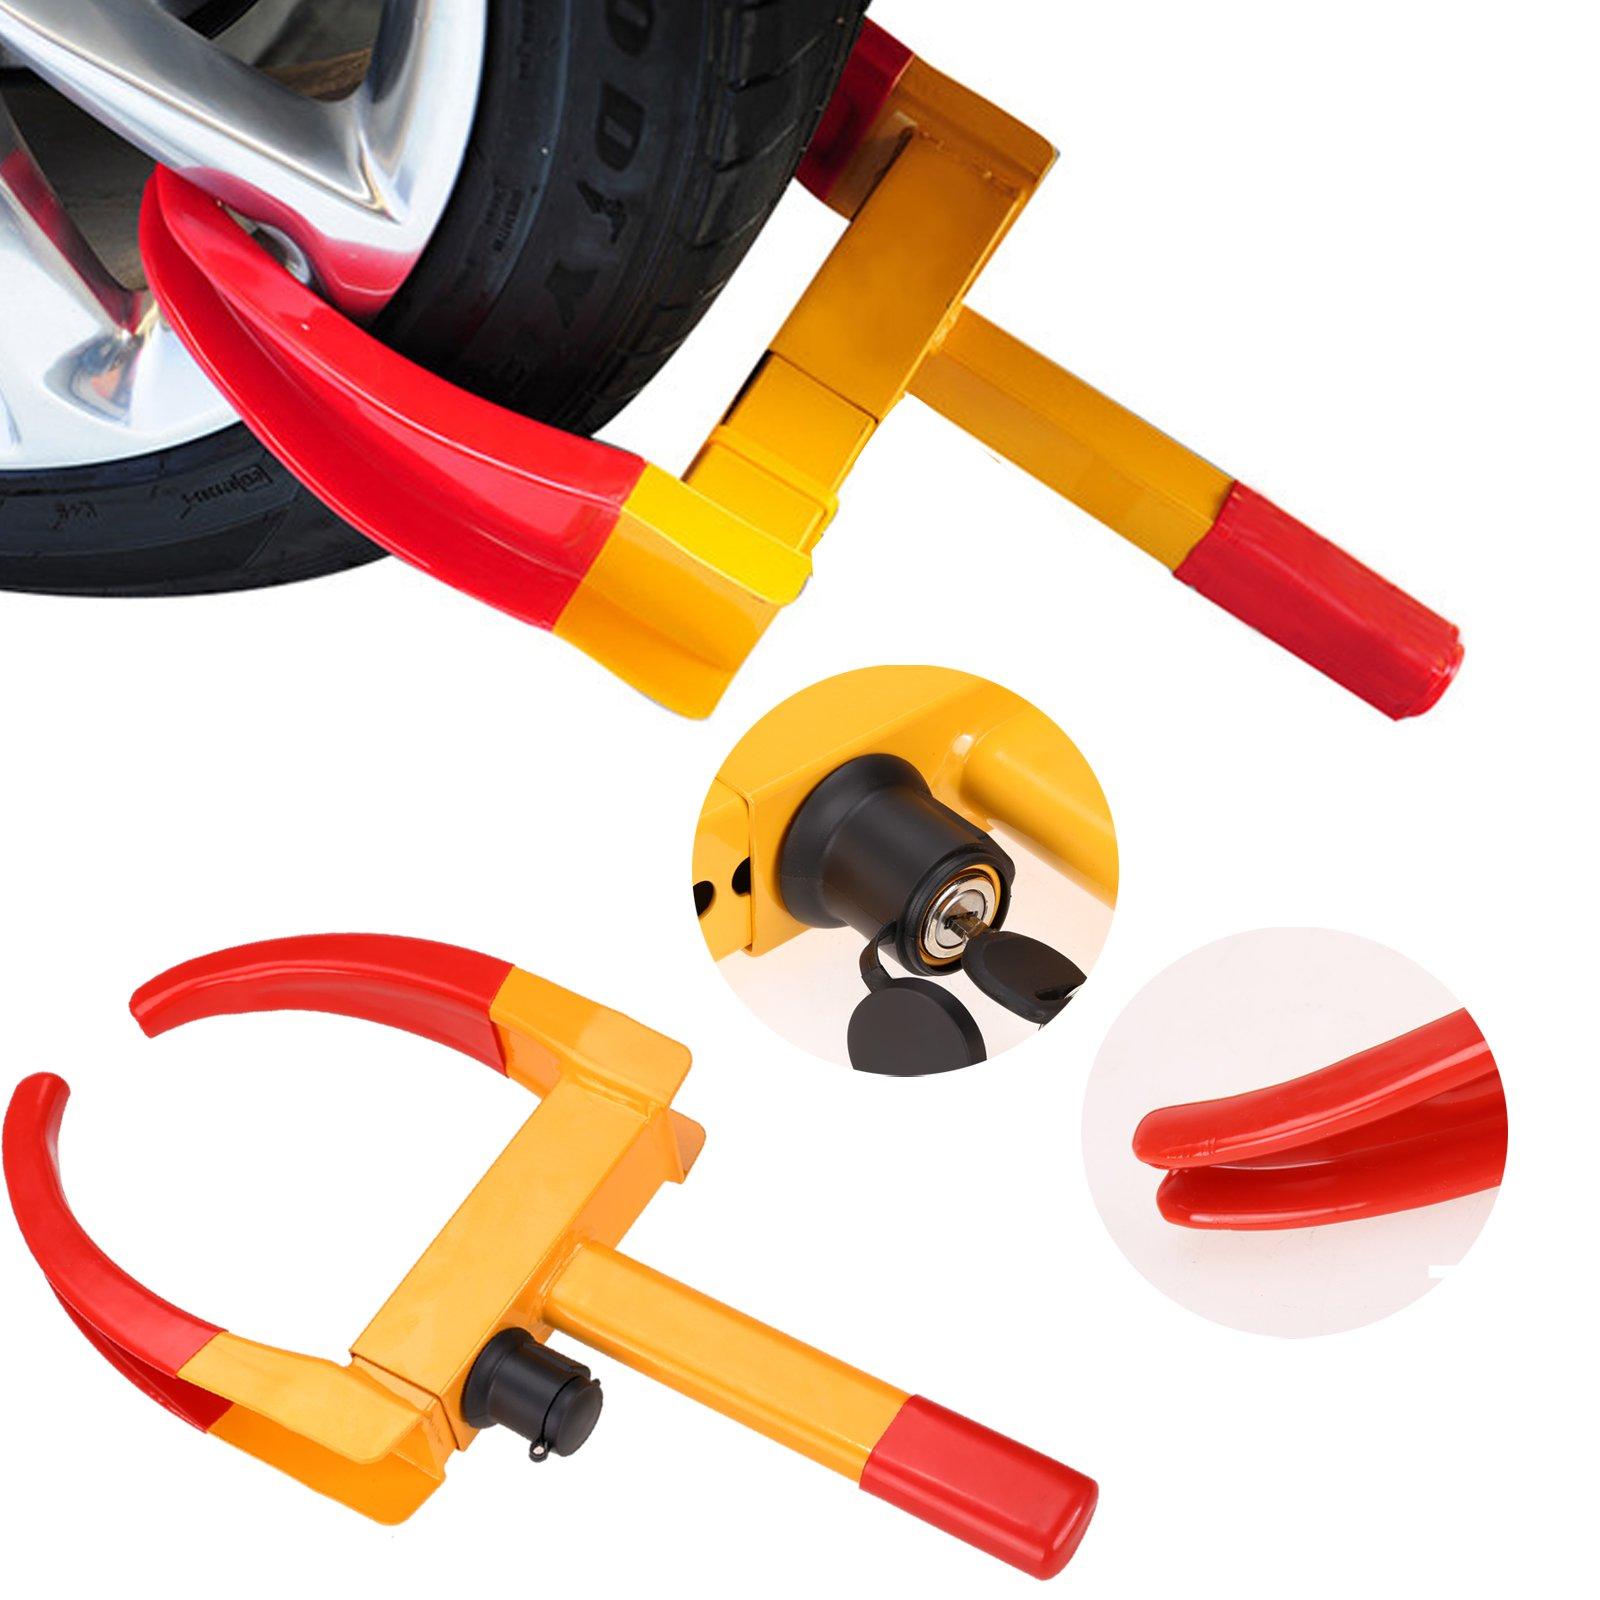 Oanon Wheel Lock Clamp Boot Tire Claw Auto Car Truck ATV, RV, Boat Trailers Heavy Duty Secure (Size 1)